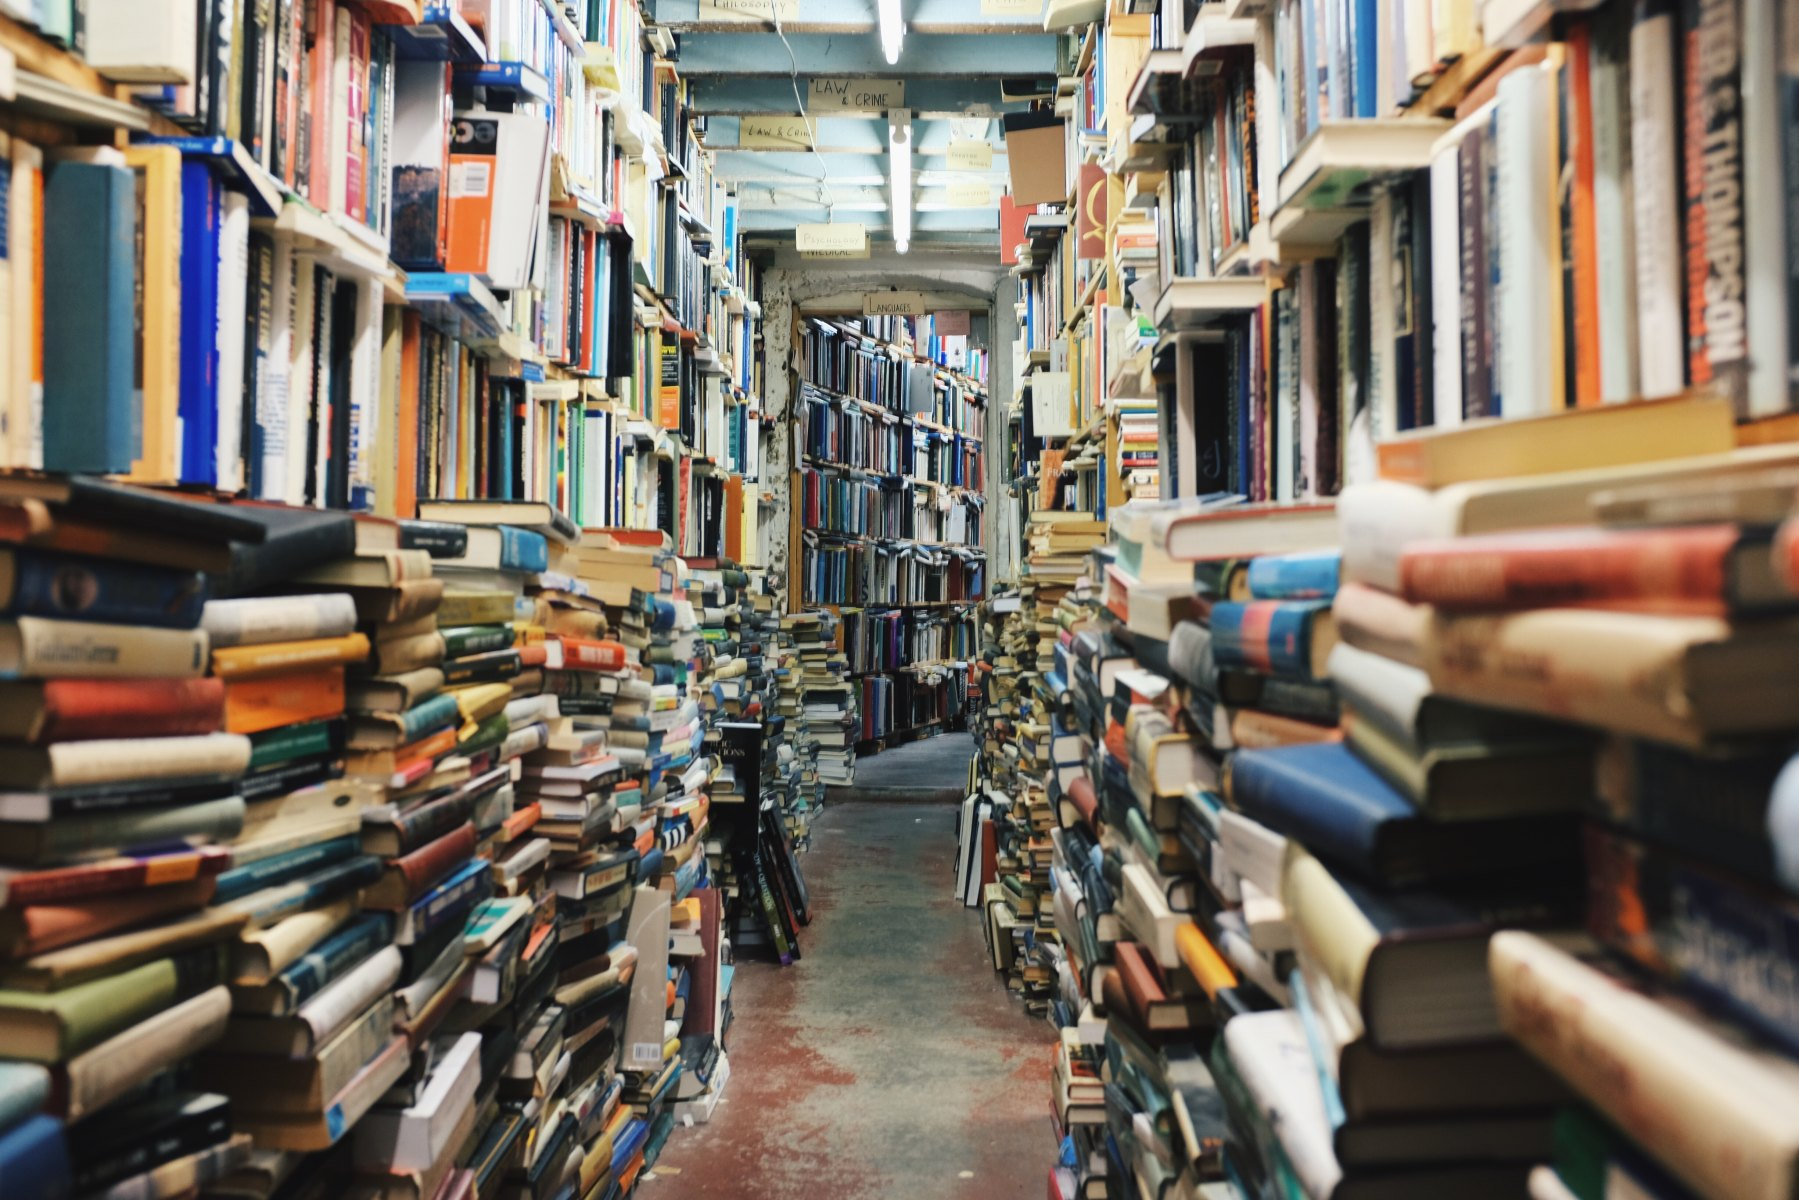 Books, library, book